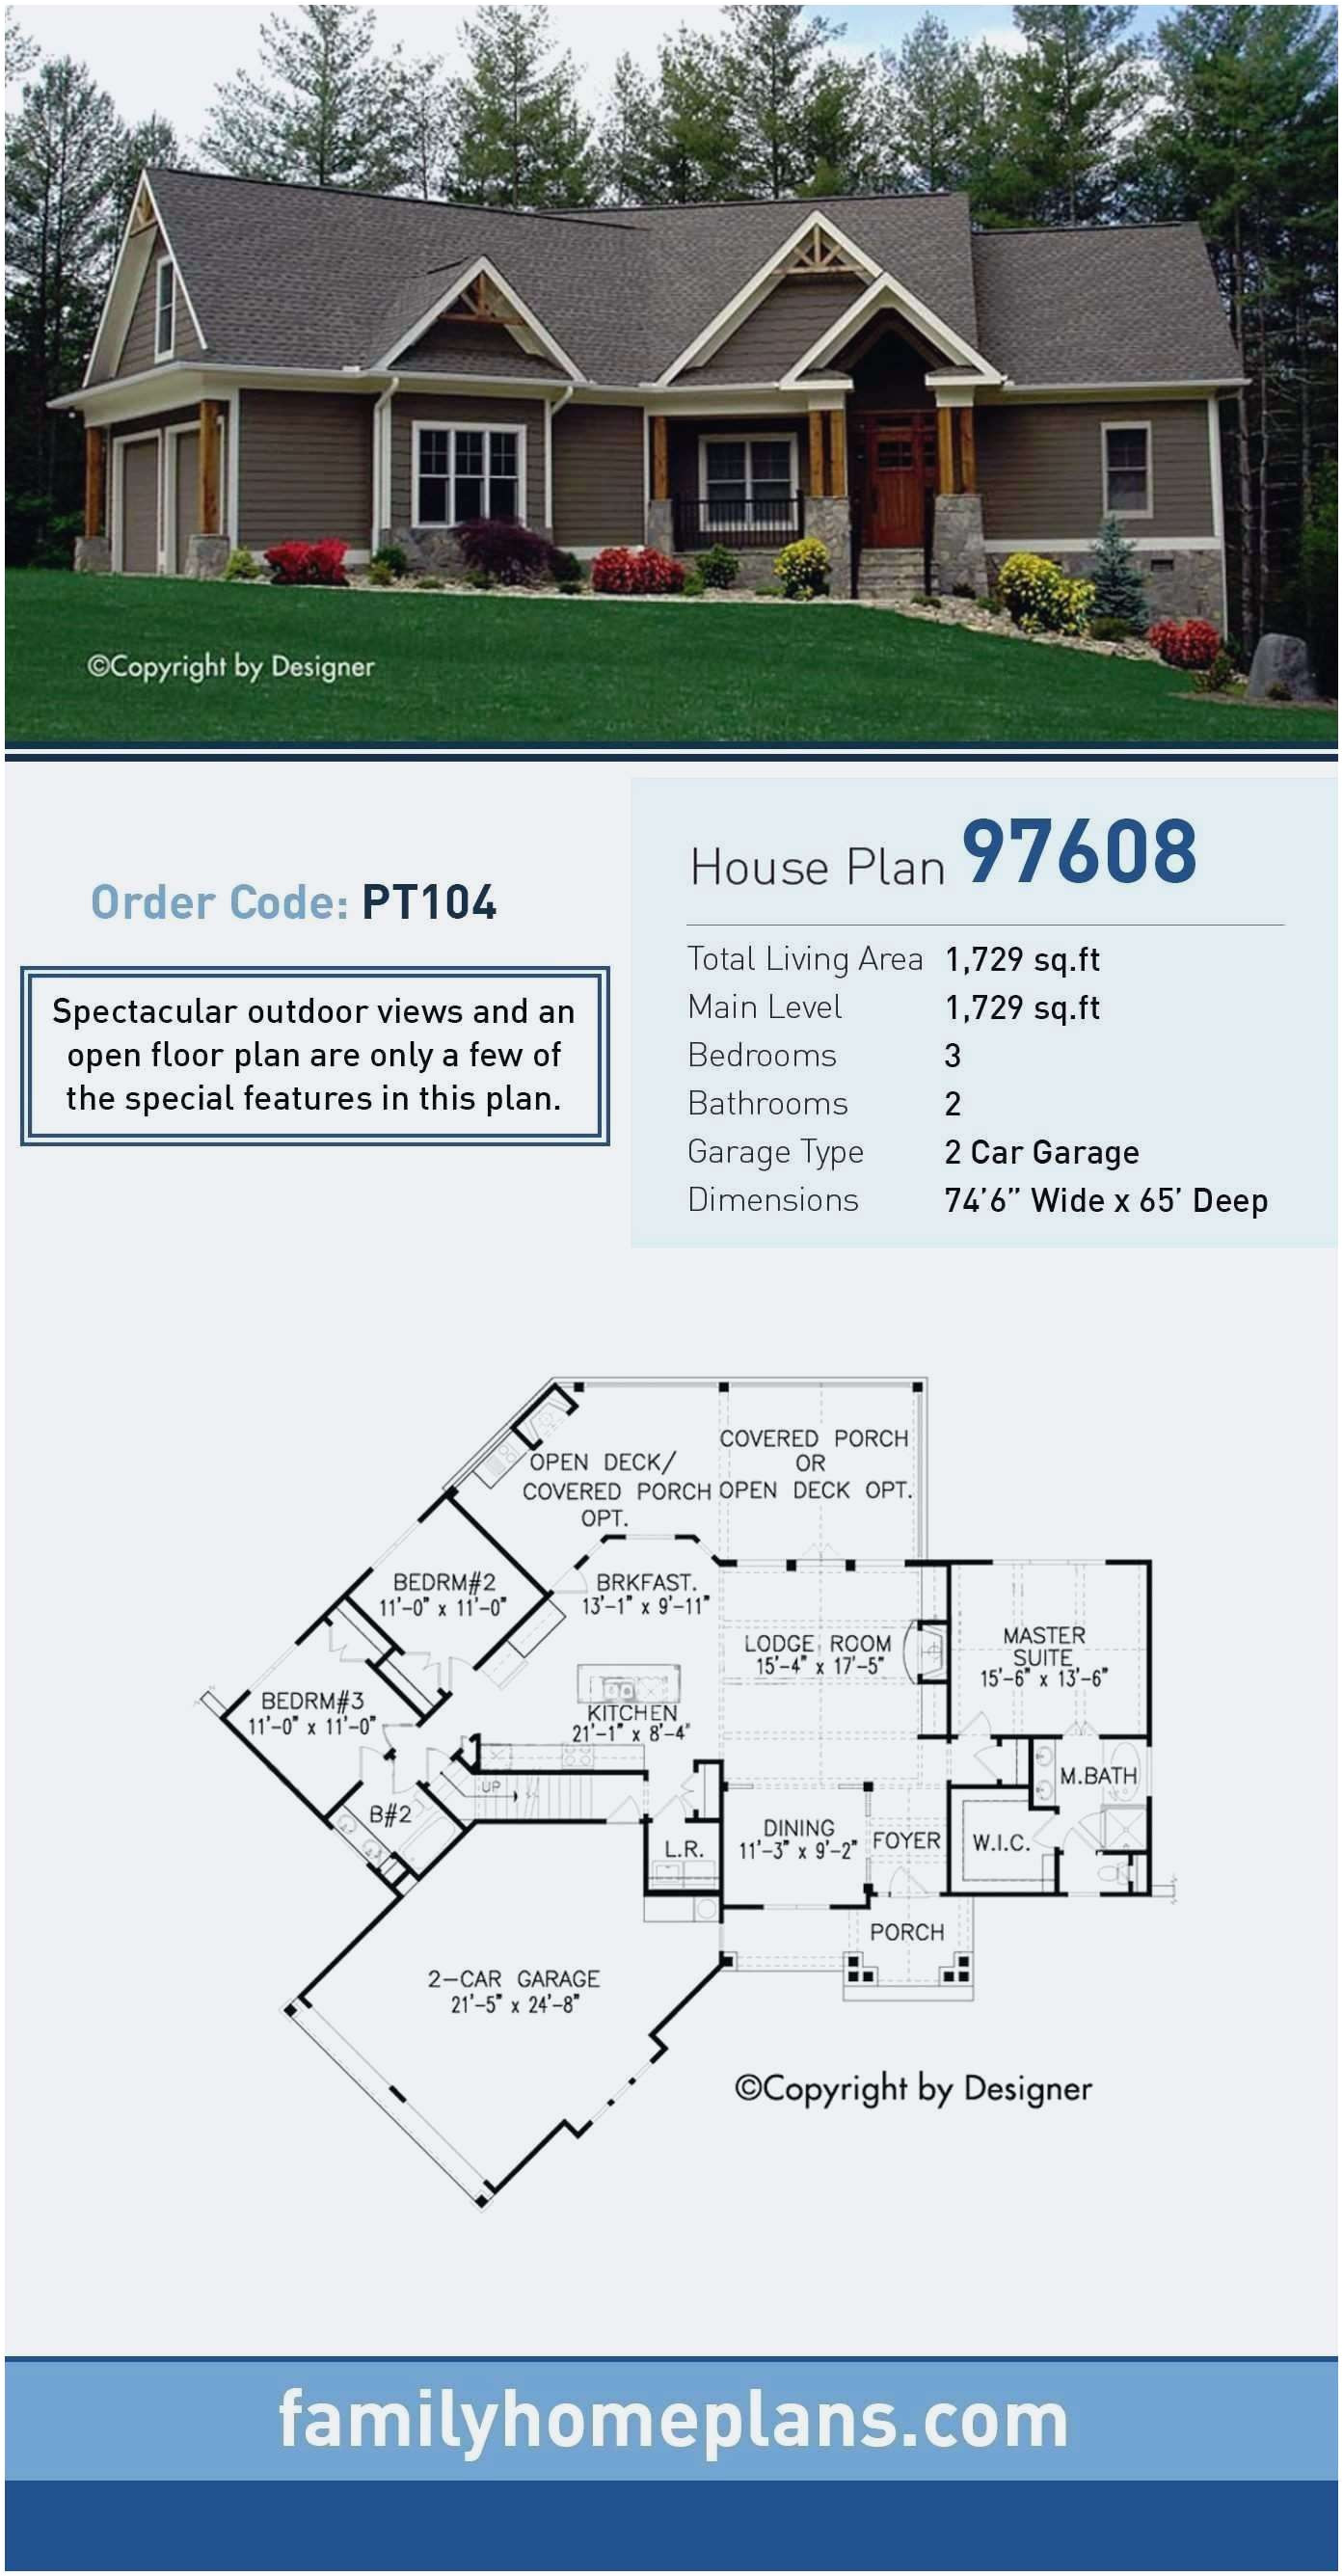 jim walter homes pictures jim walter homes plans new 20 luxury jim walters homes floor plans